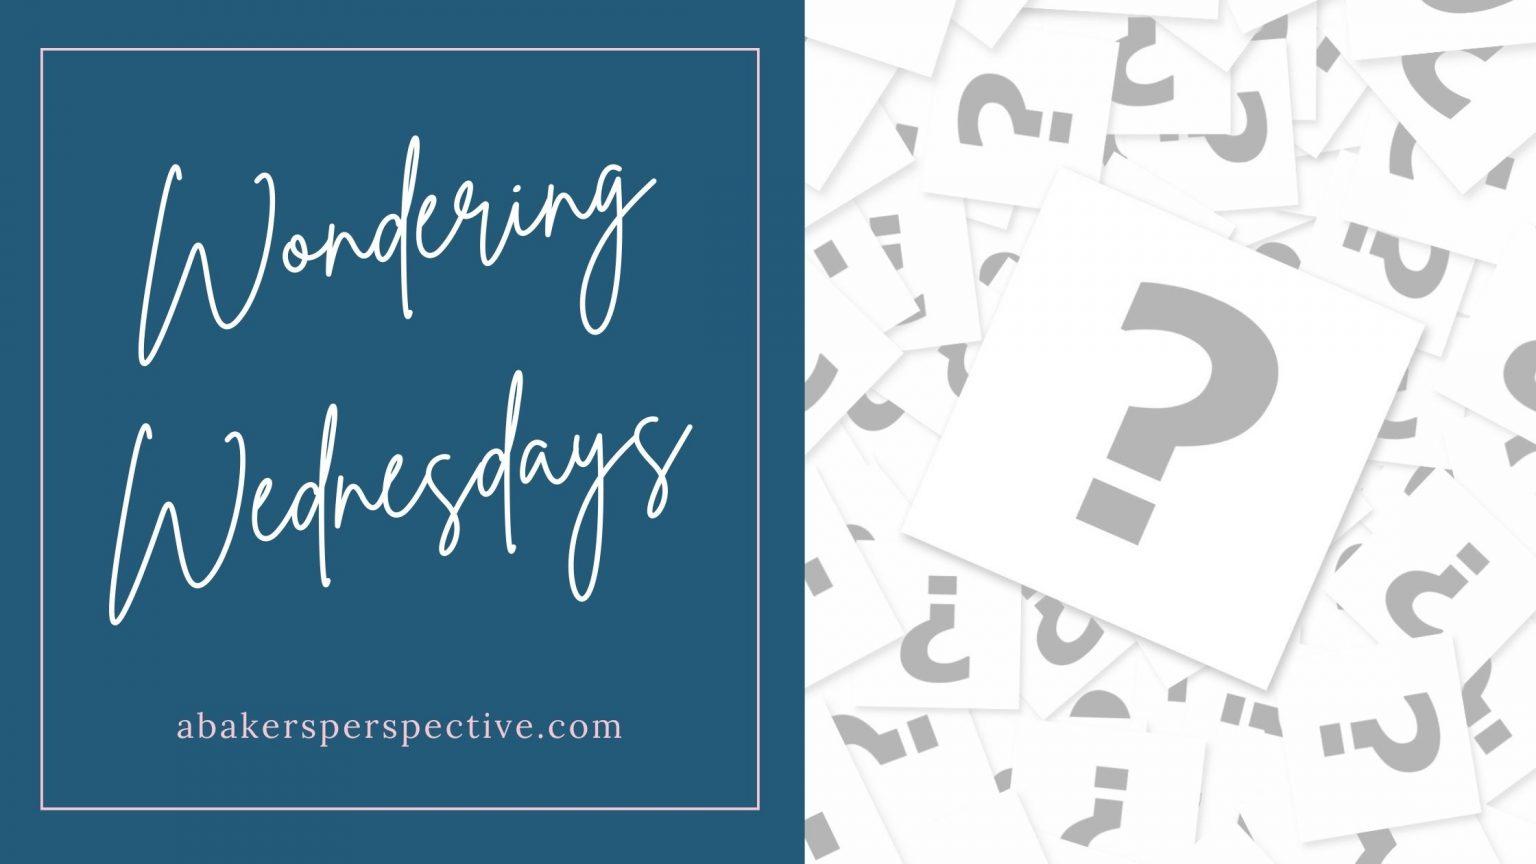 Wondering Wednesdays meme (white cursive lettering on a blue background)